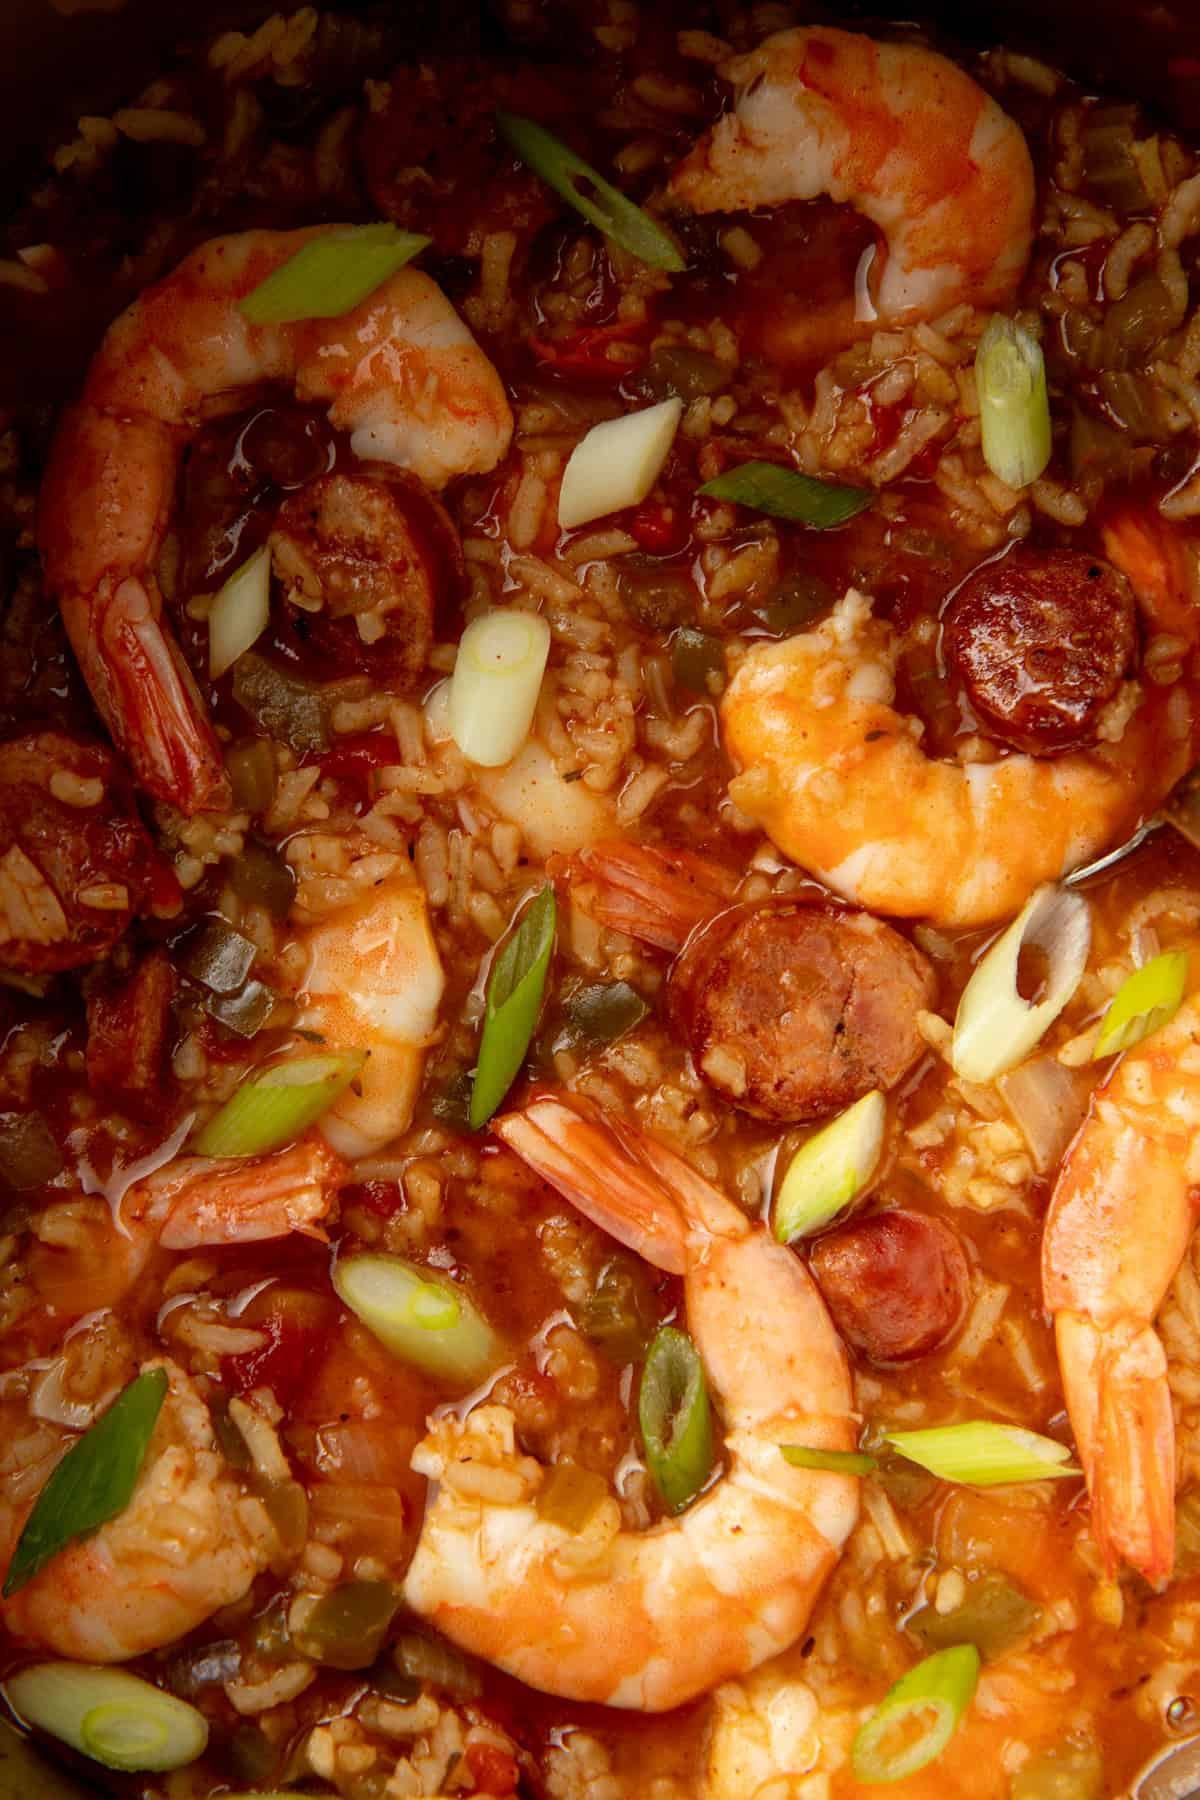 Shrimp and sausage jambalaya topped with scallions